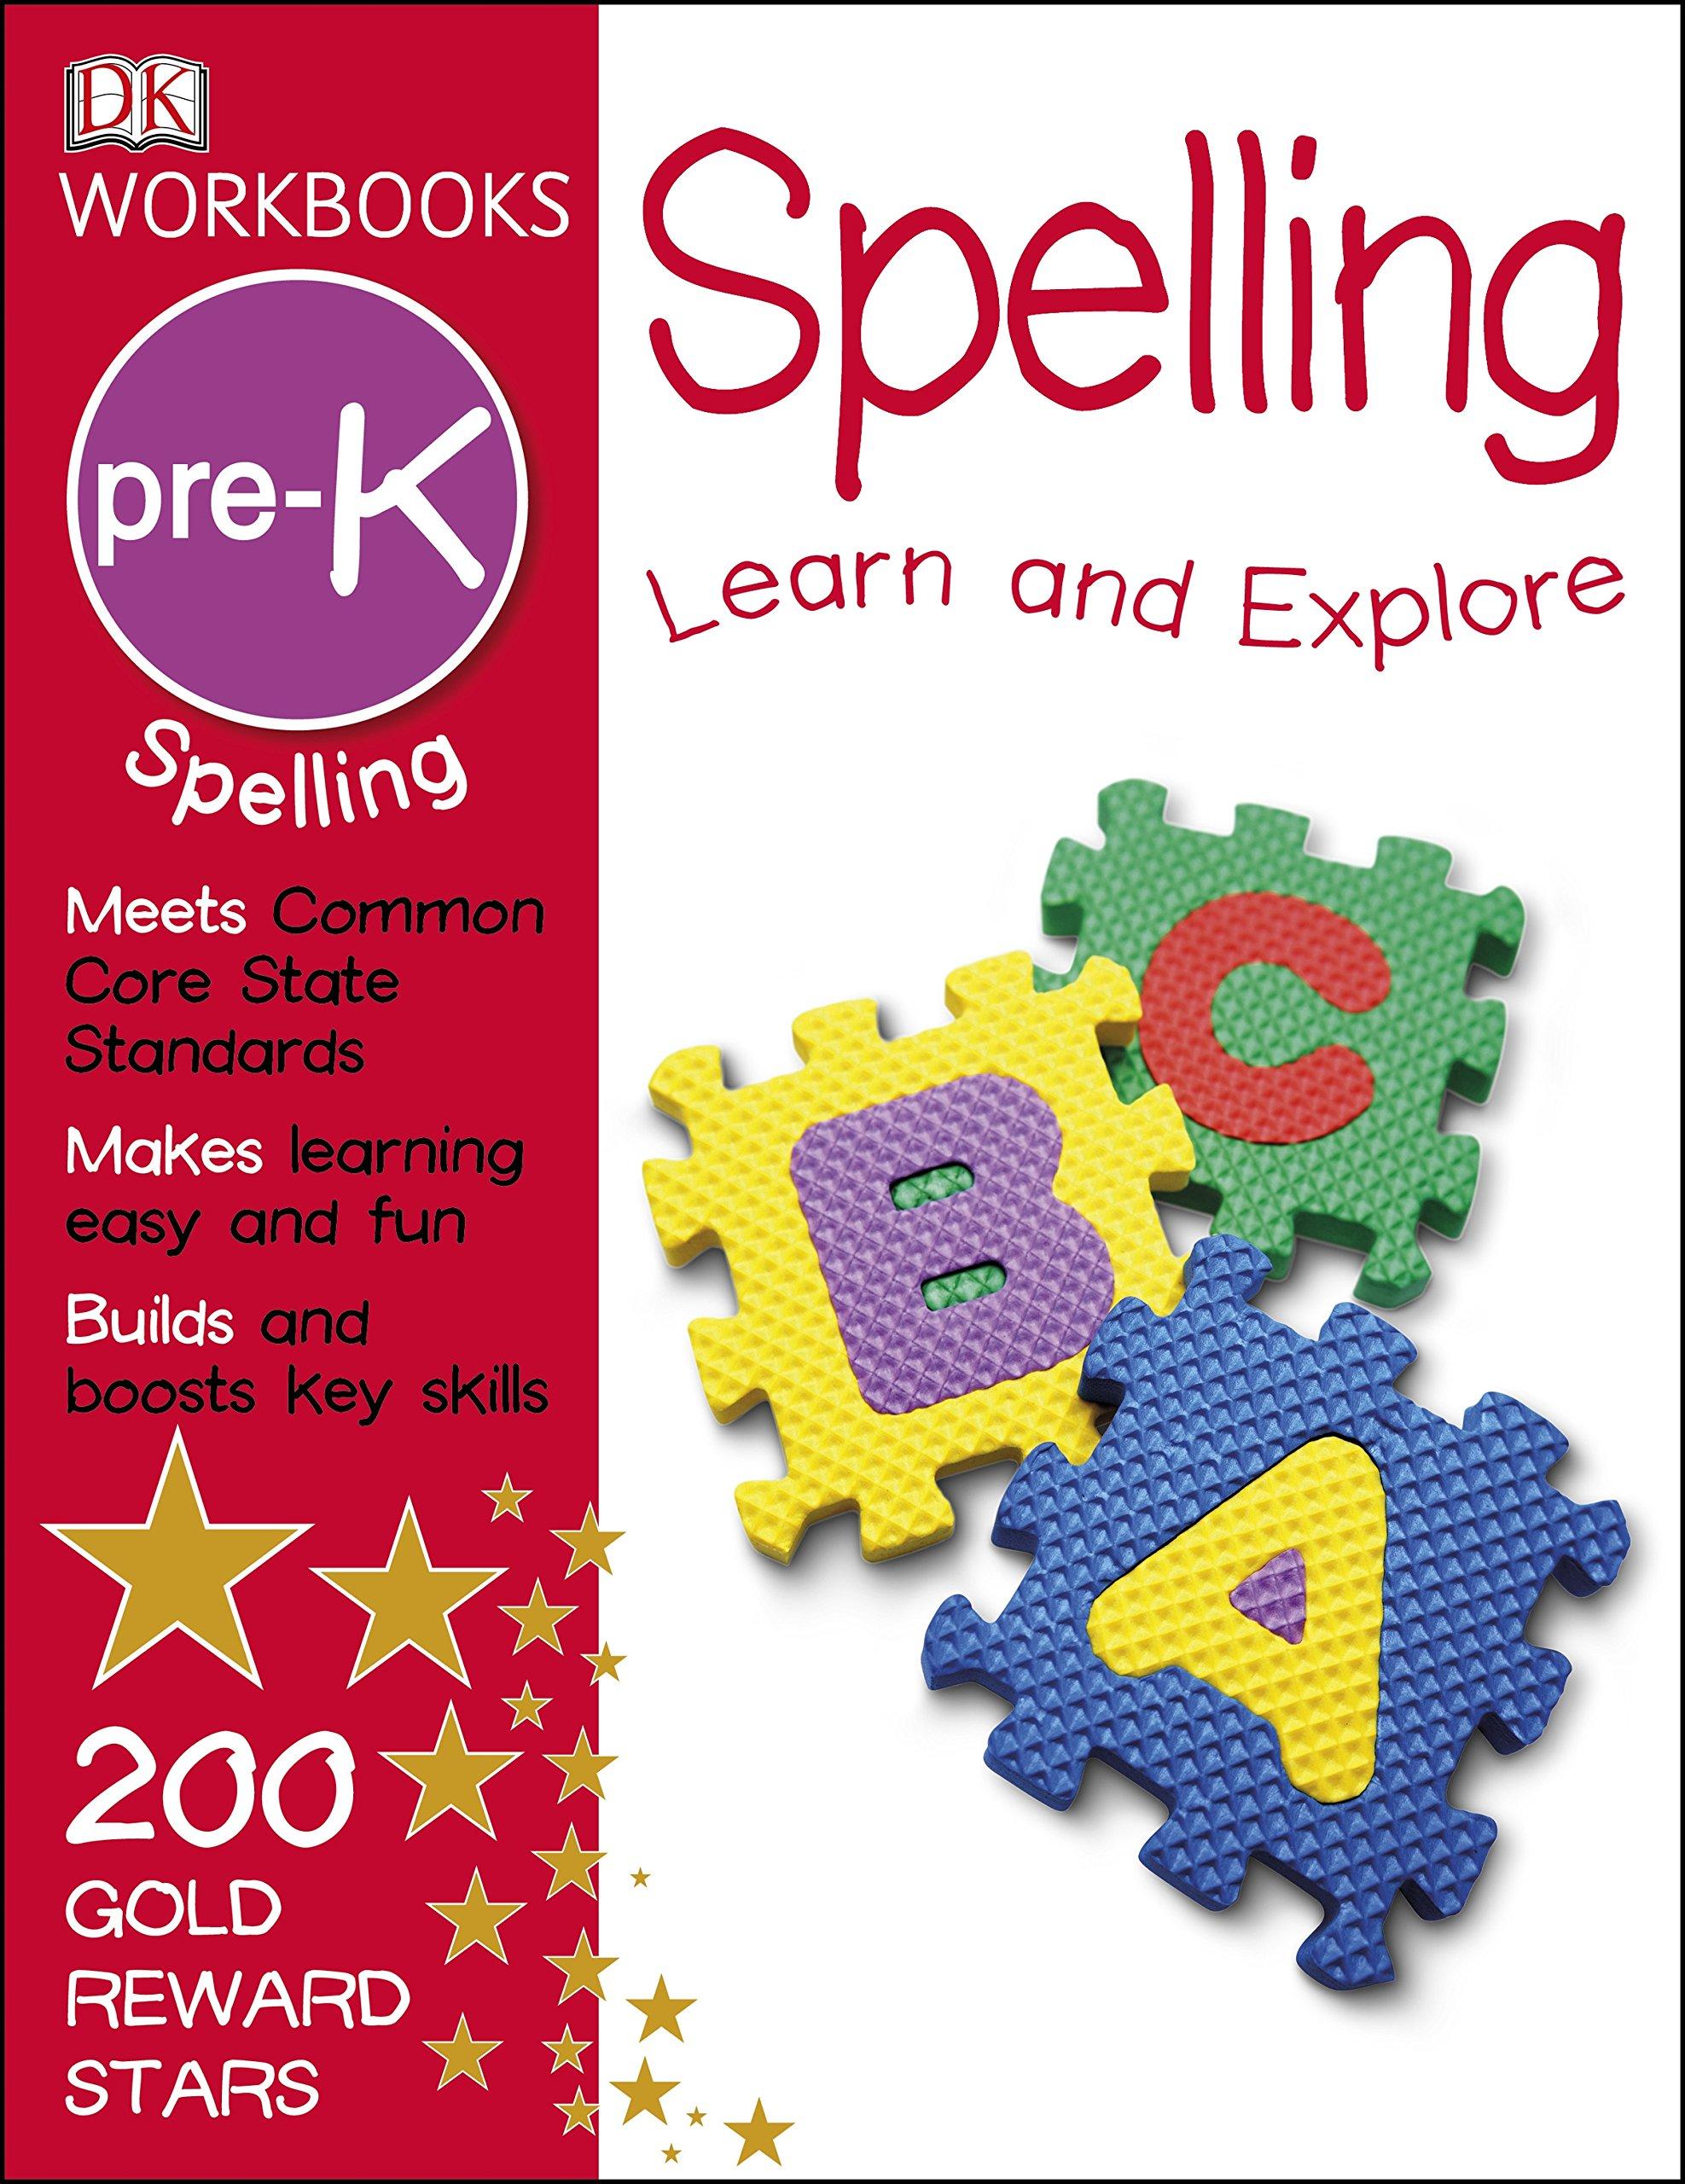 DK Workbooks Spelling Pre K